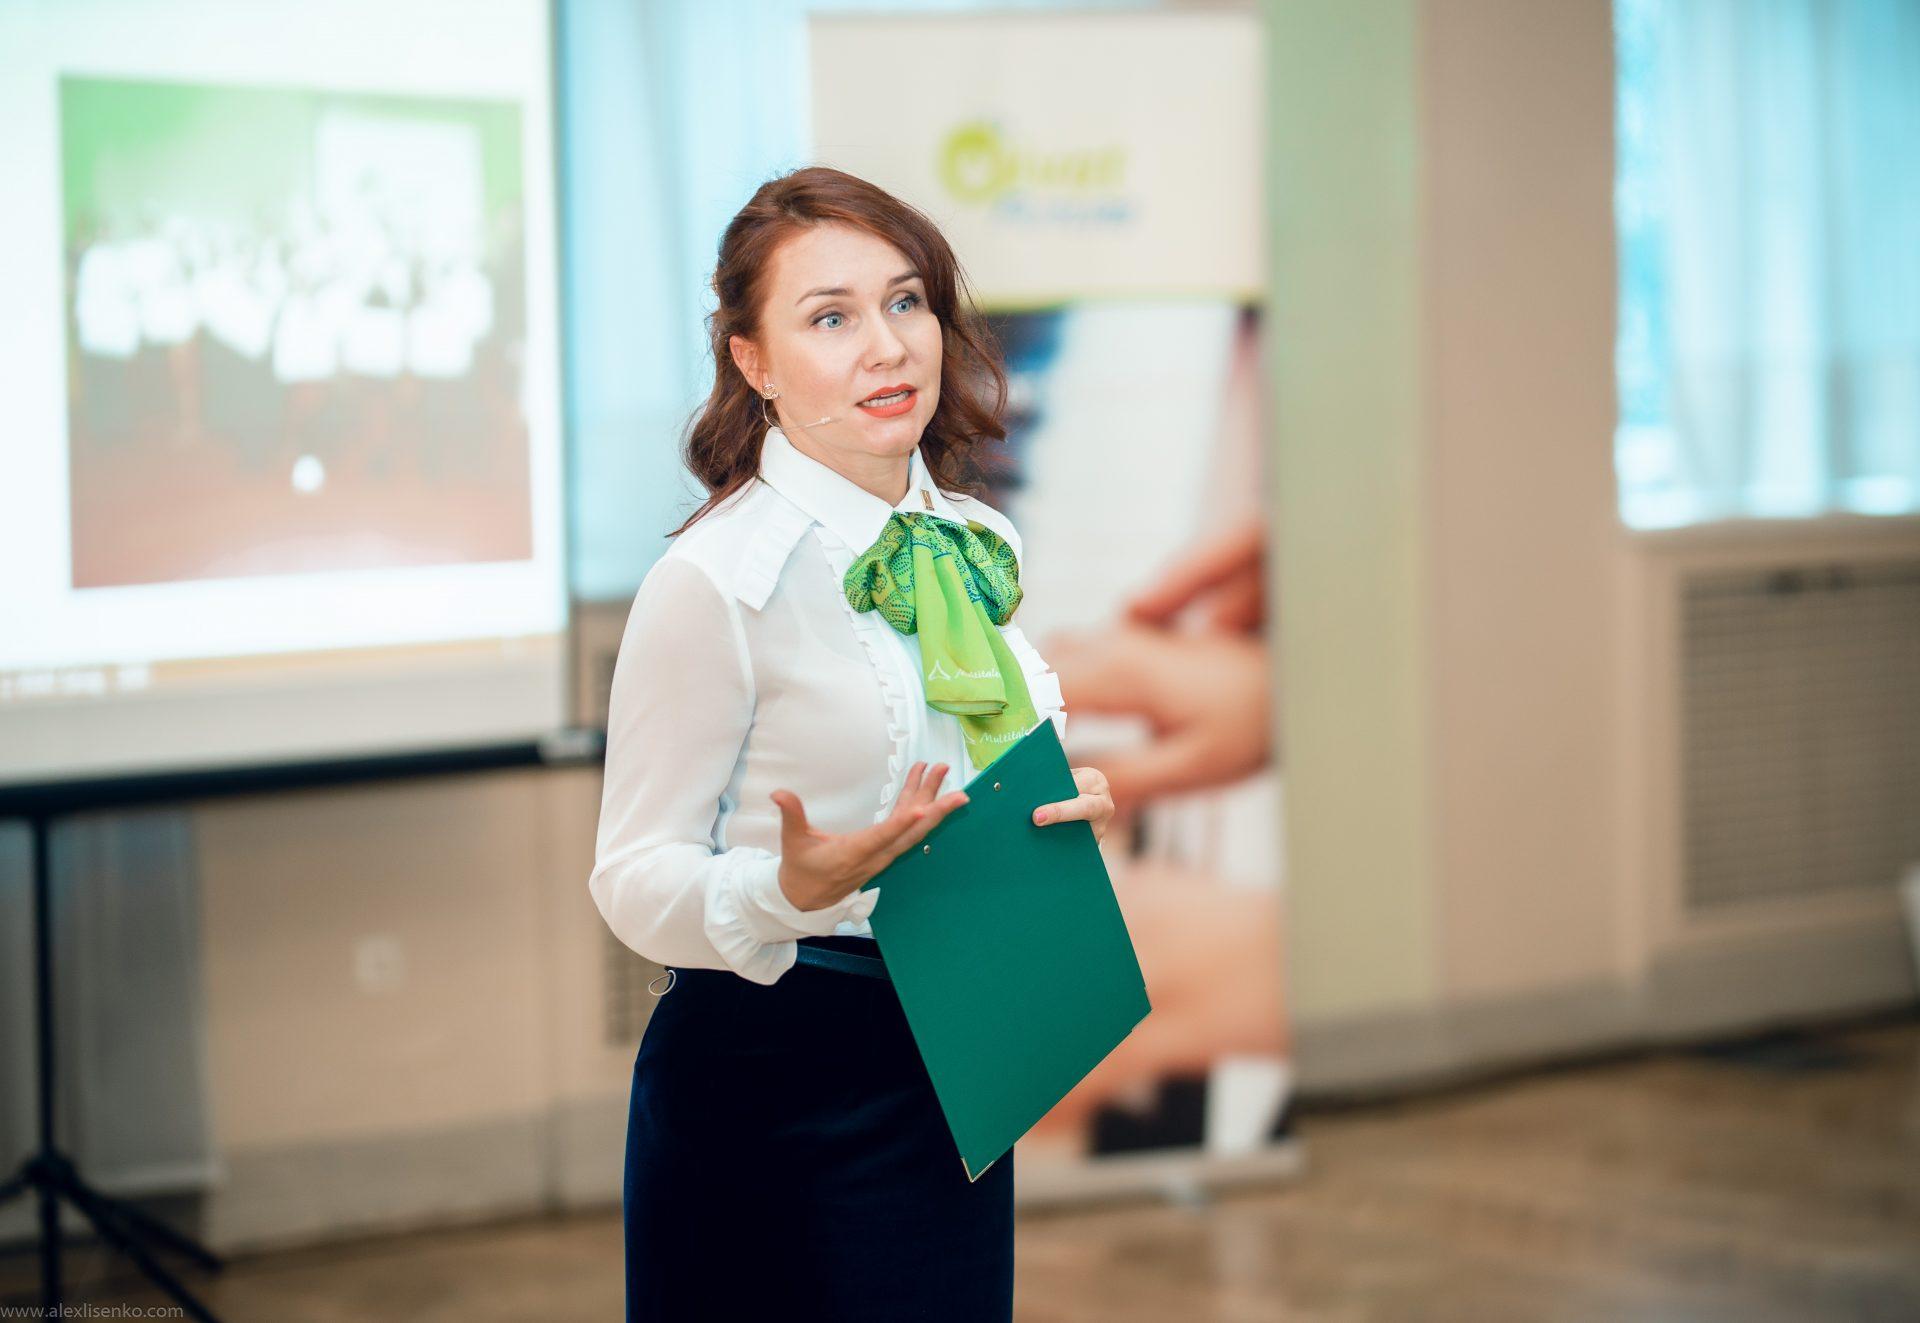 Нелли Пешко, специалист в области финансов и инвестиций. 2